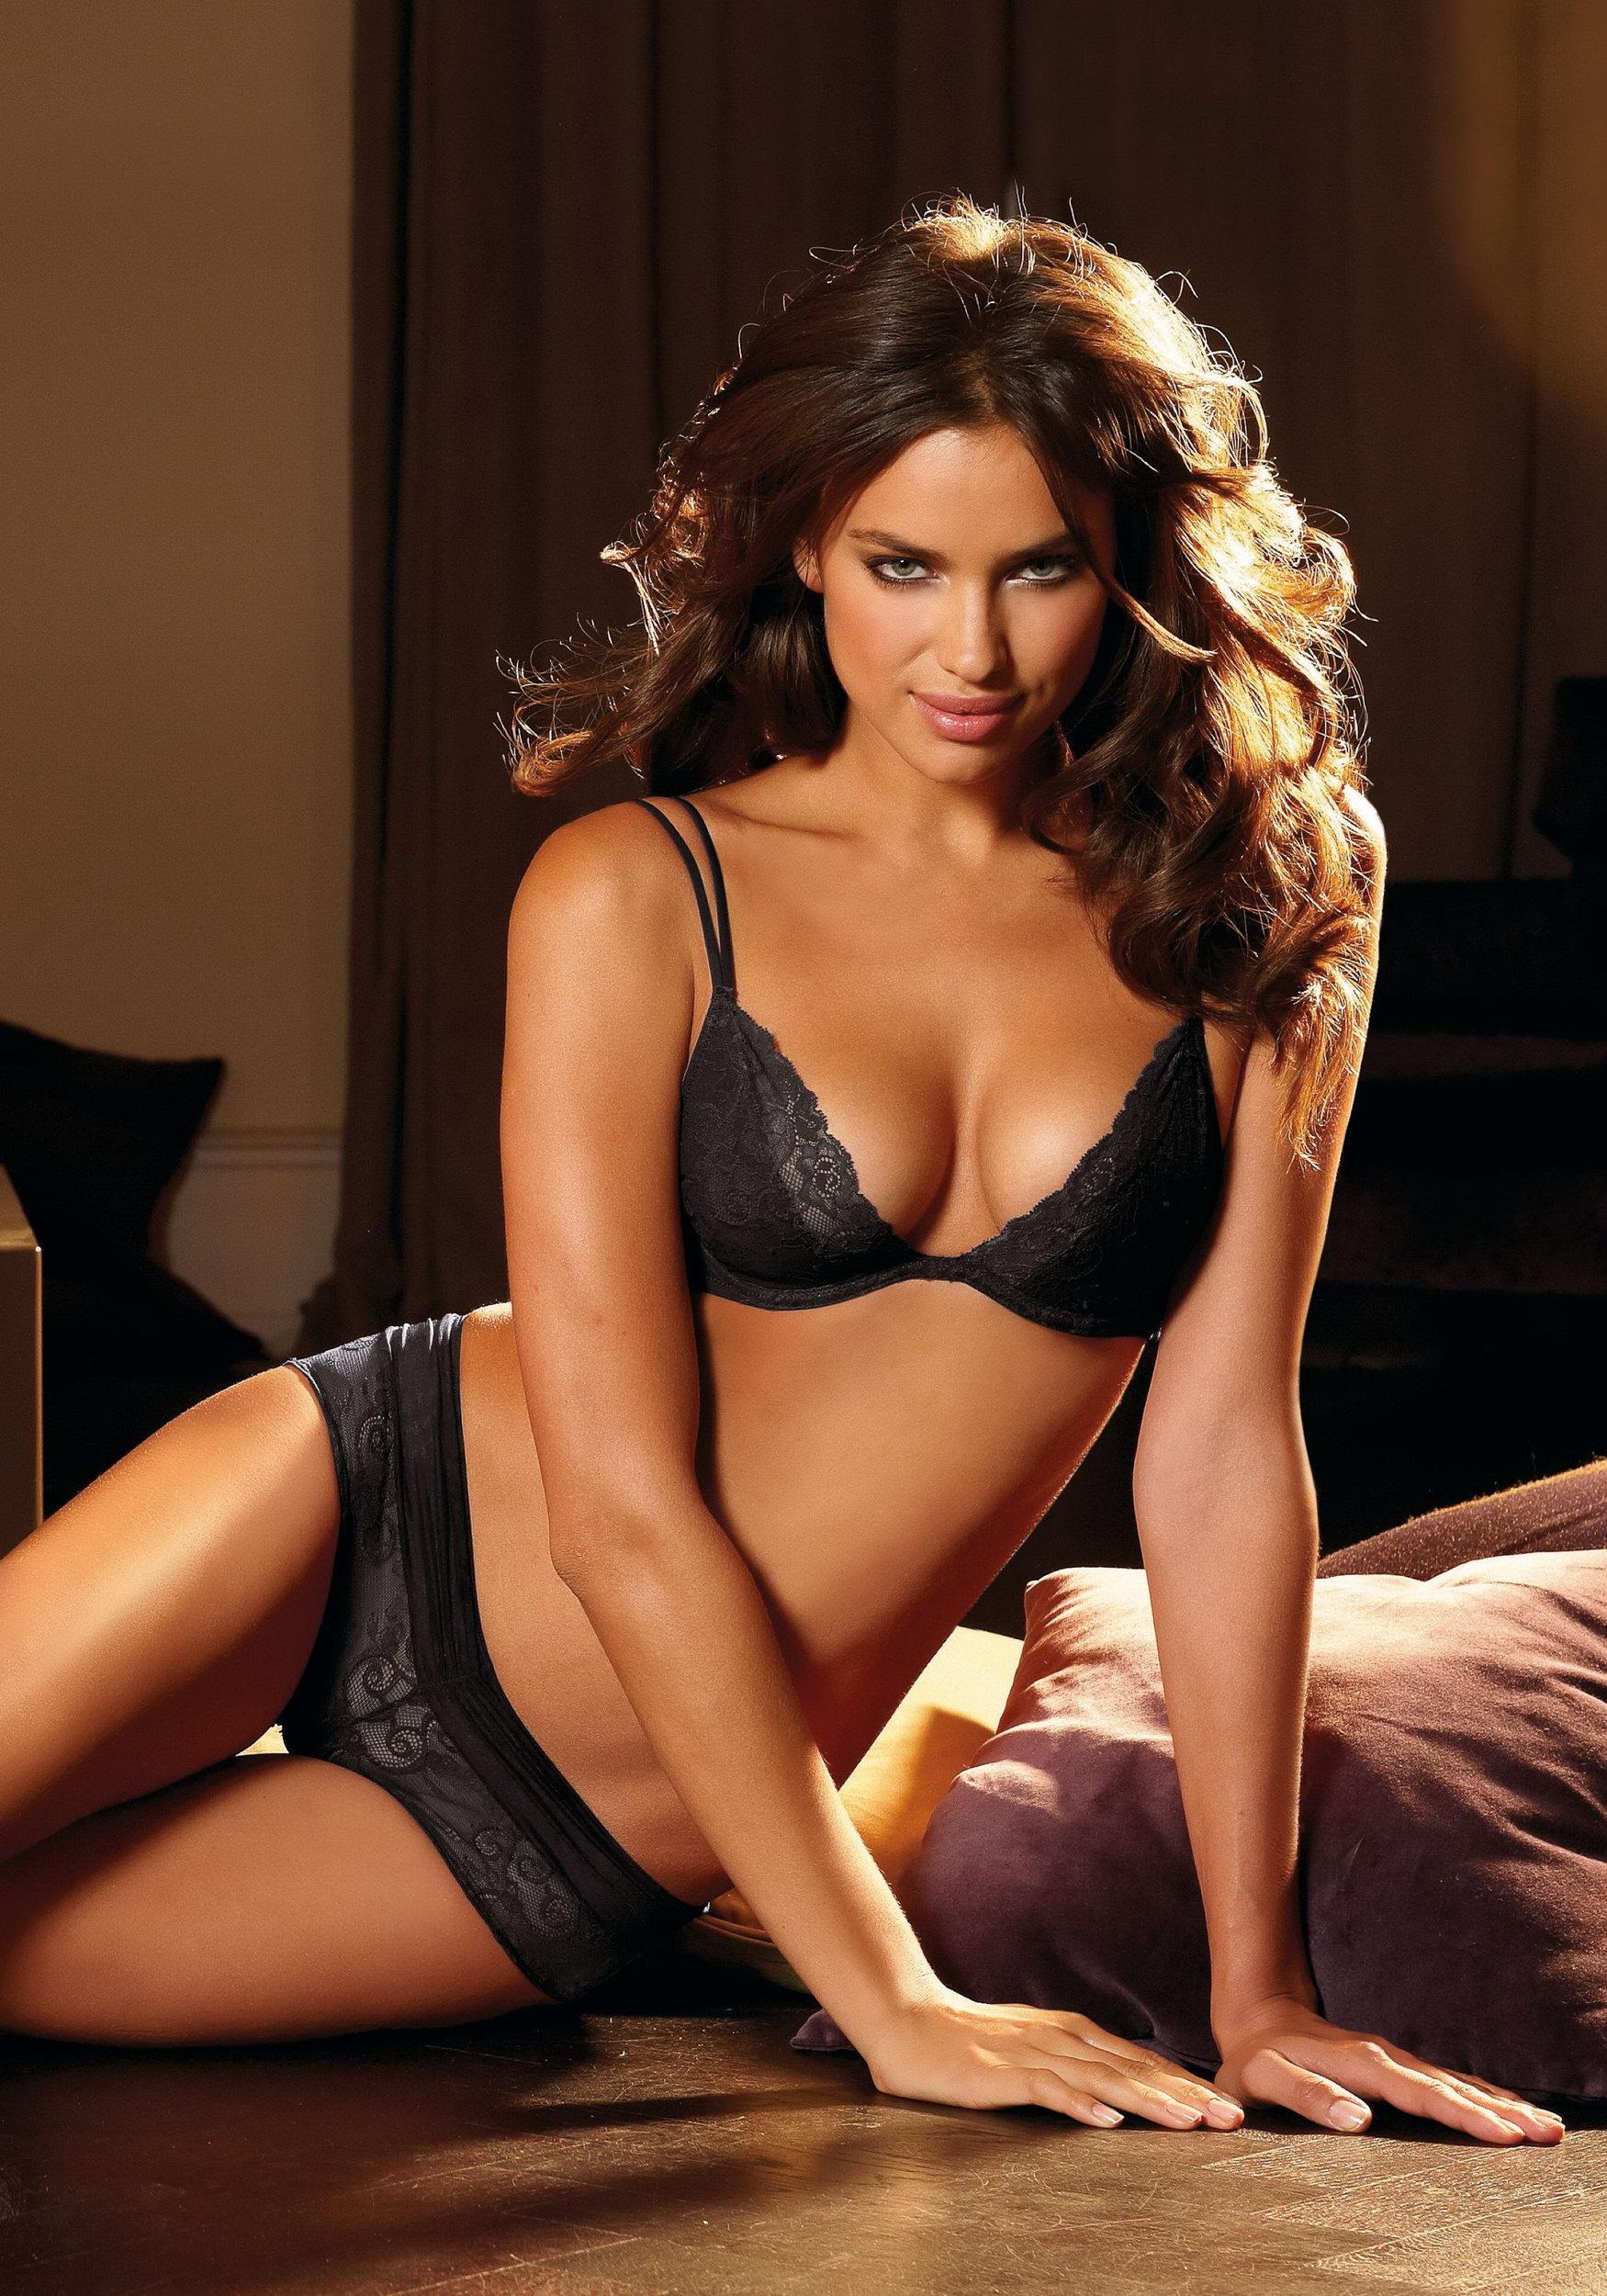 Irina Sheik photo 821 of 4824 pics, wallpaper - photo ... Bradley Cooper Md